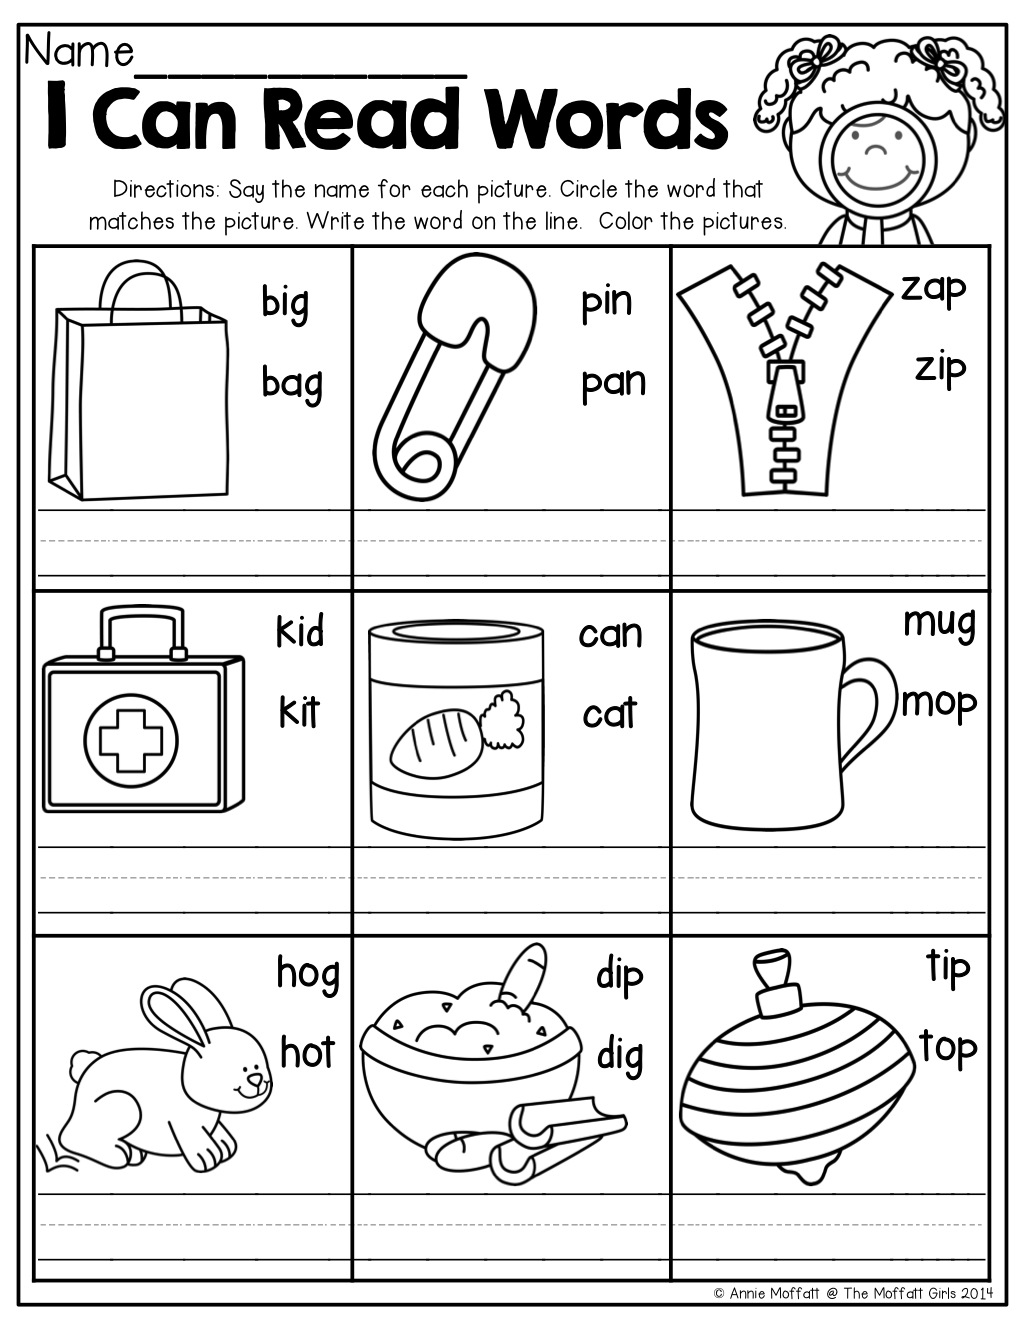 hight resolution of The Moffatt Girls: St. Patrick's Day NO PREP Packets!   Phonics kindergarten